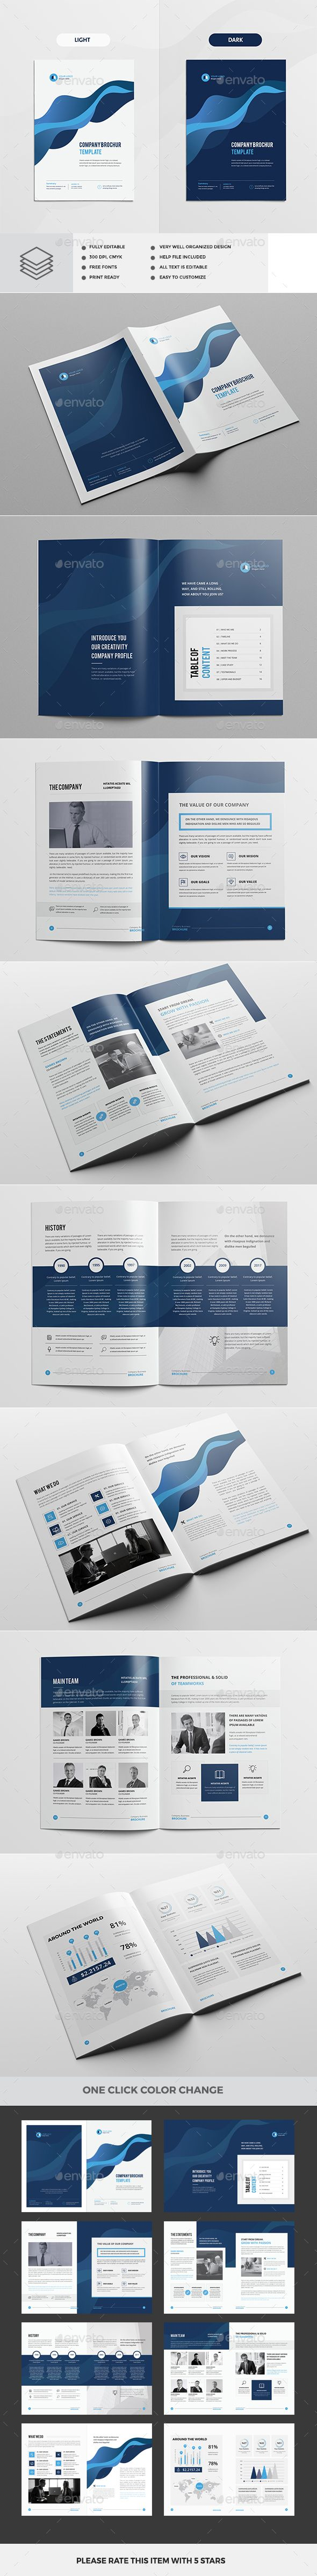 Clean & Modern Multipurpose Brochure V2   Empresas y Modelo